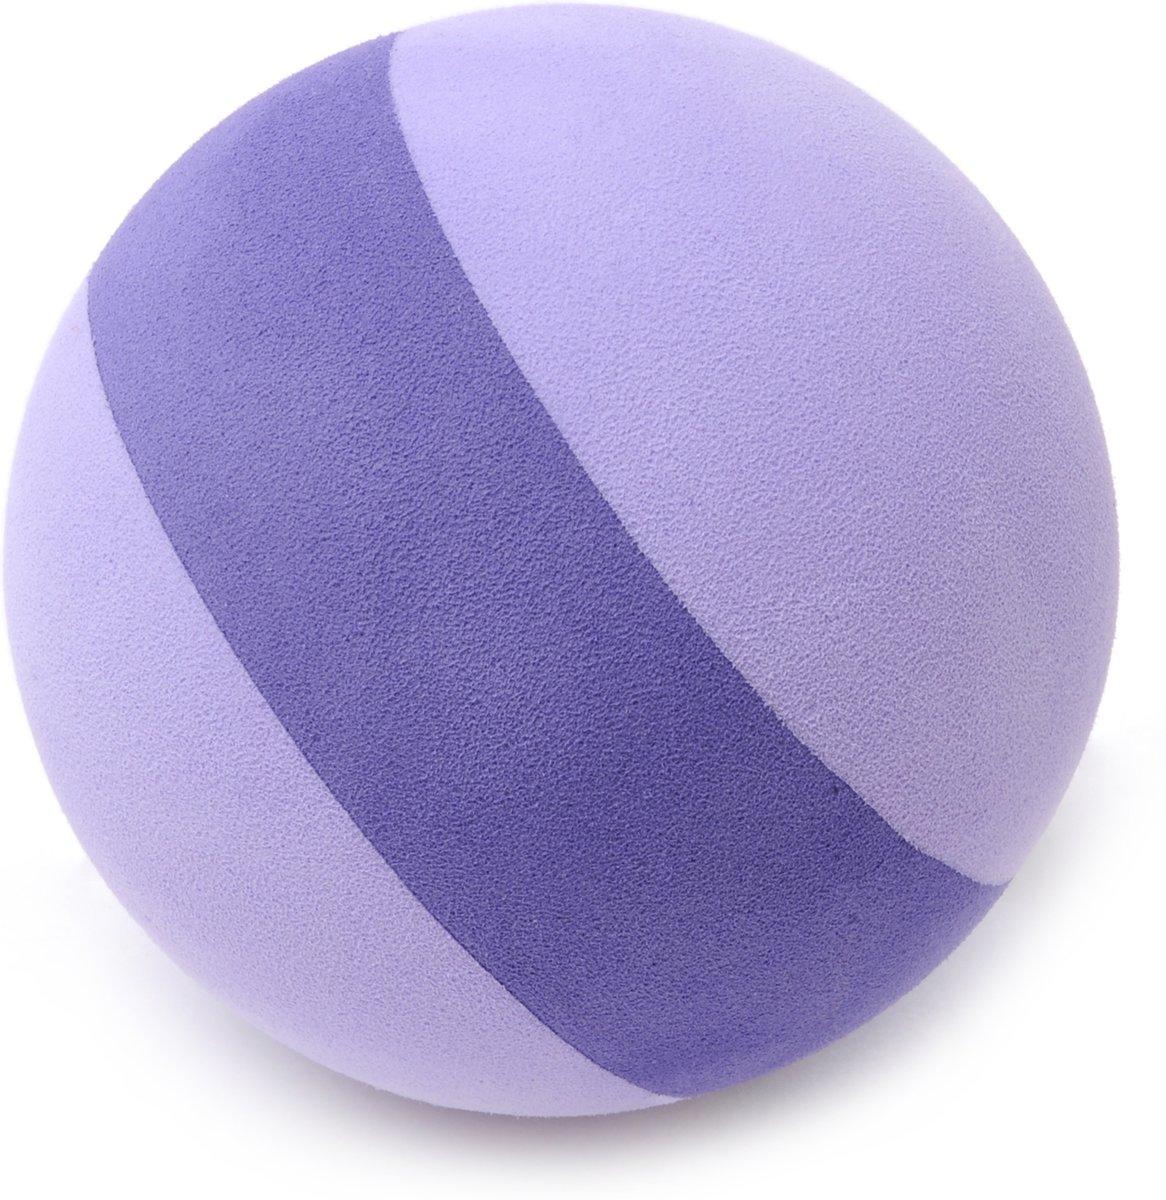 YOGISTAR Fascia massagebal - paars-violet - EVA - 9 cm - - - Yogablok kopen